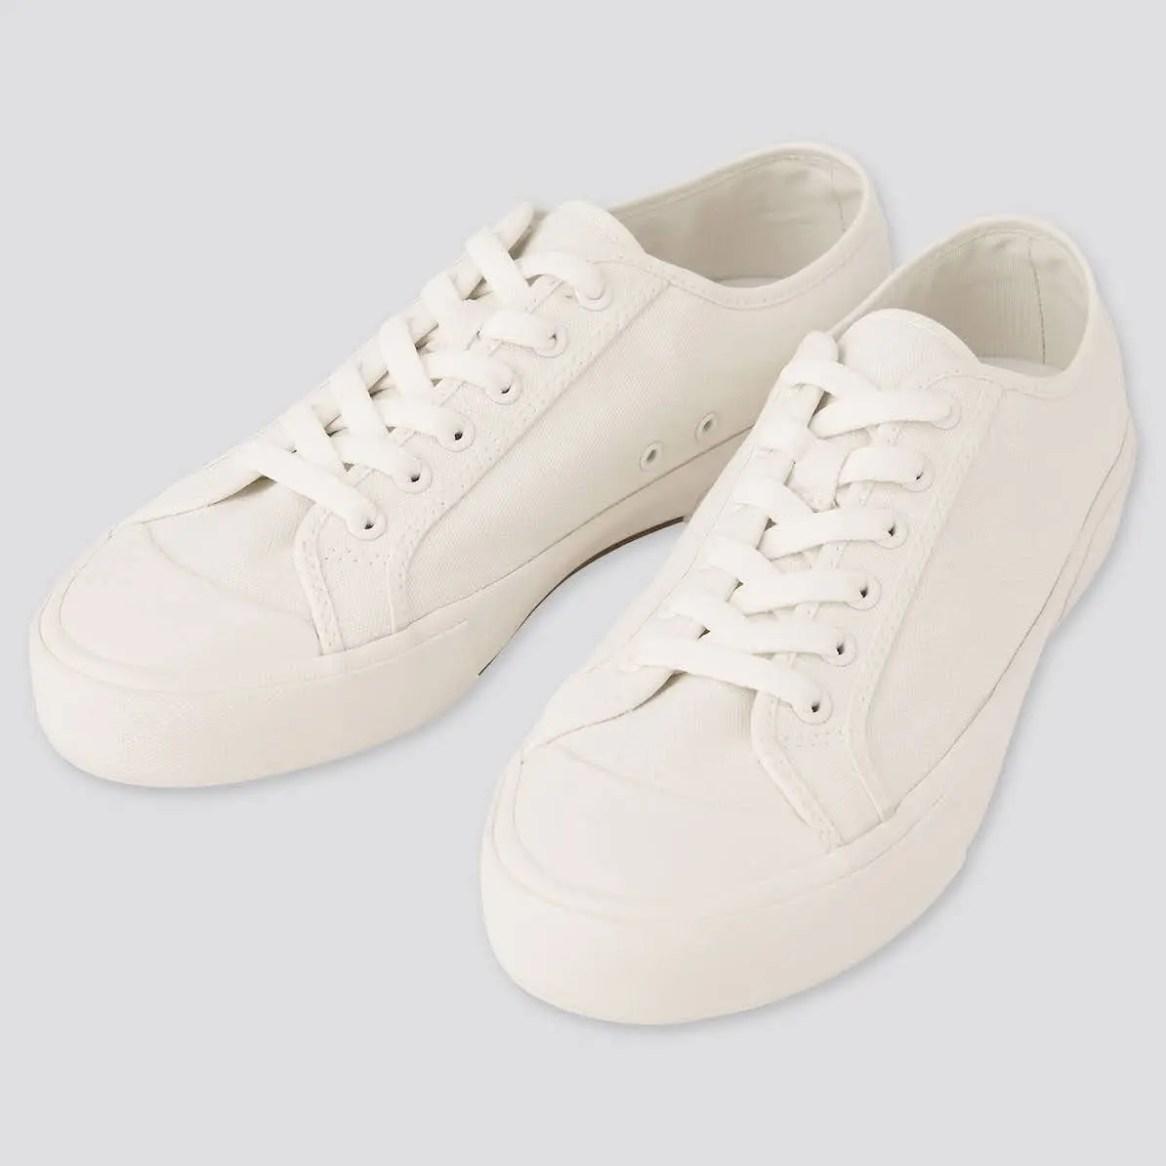 UNIQLO ユニクロ コットン キャンバス スニーカー オフホワイト cotton-canvas-sneaker-off-white